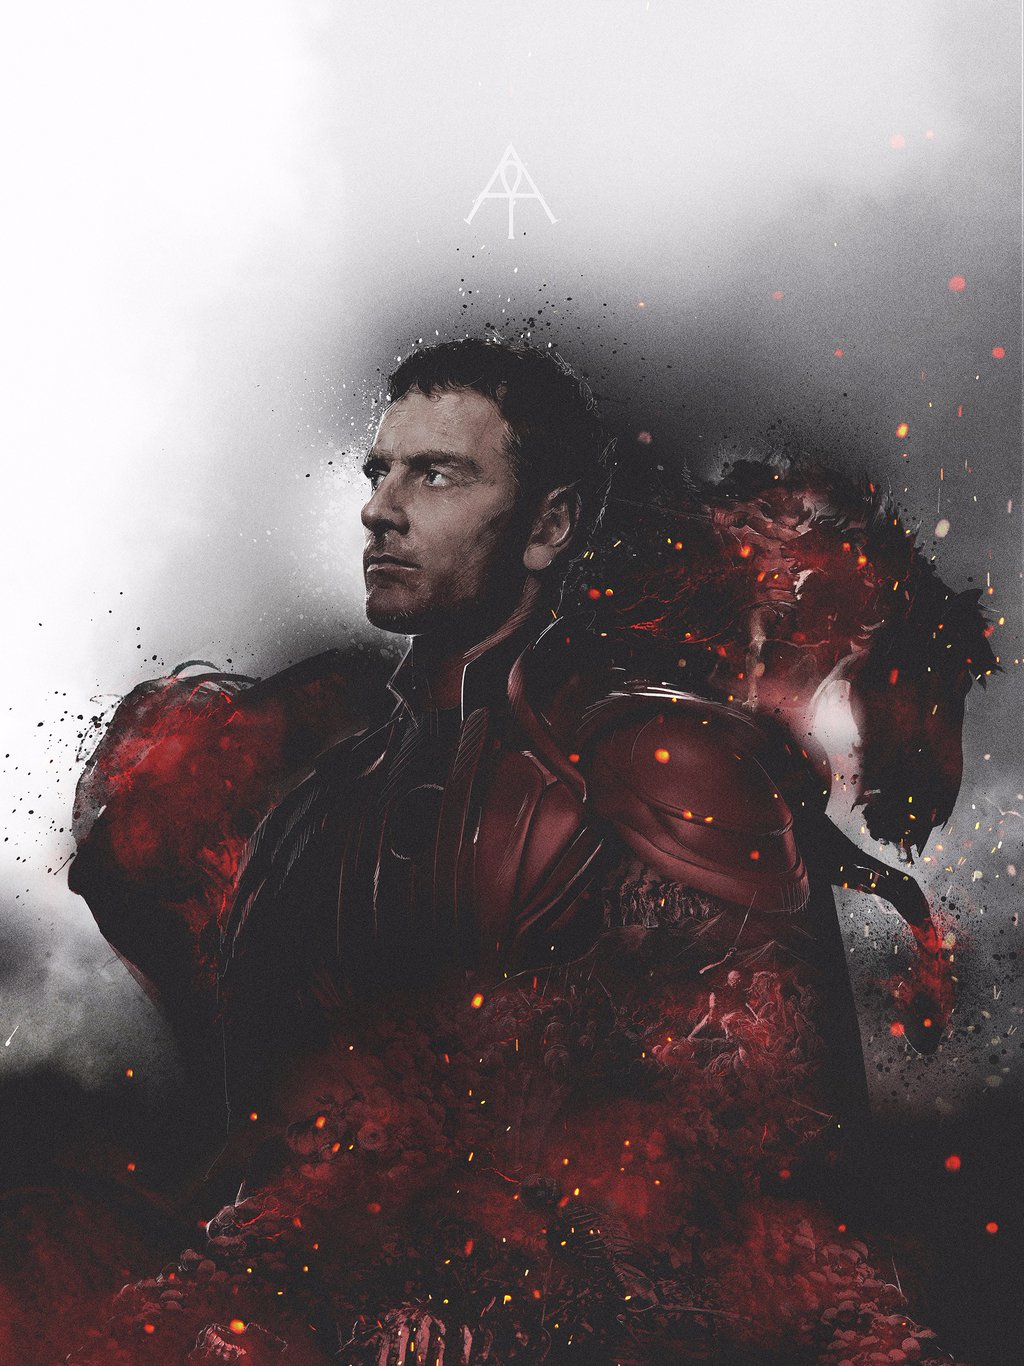 X-Men: Apocalypse's Four Horsemen Get Their Own Posters Apocalypse